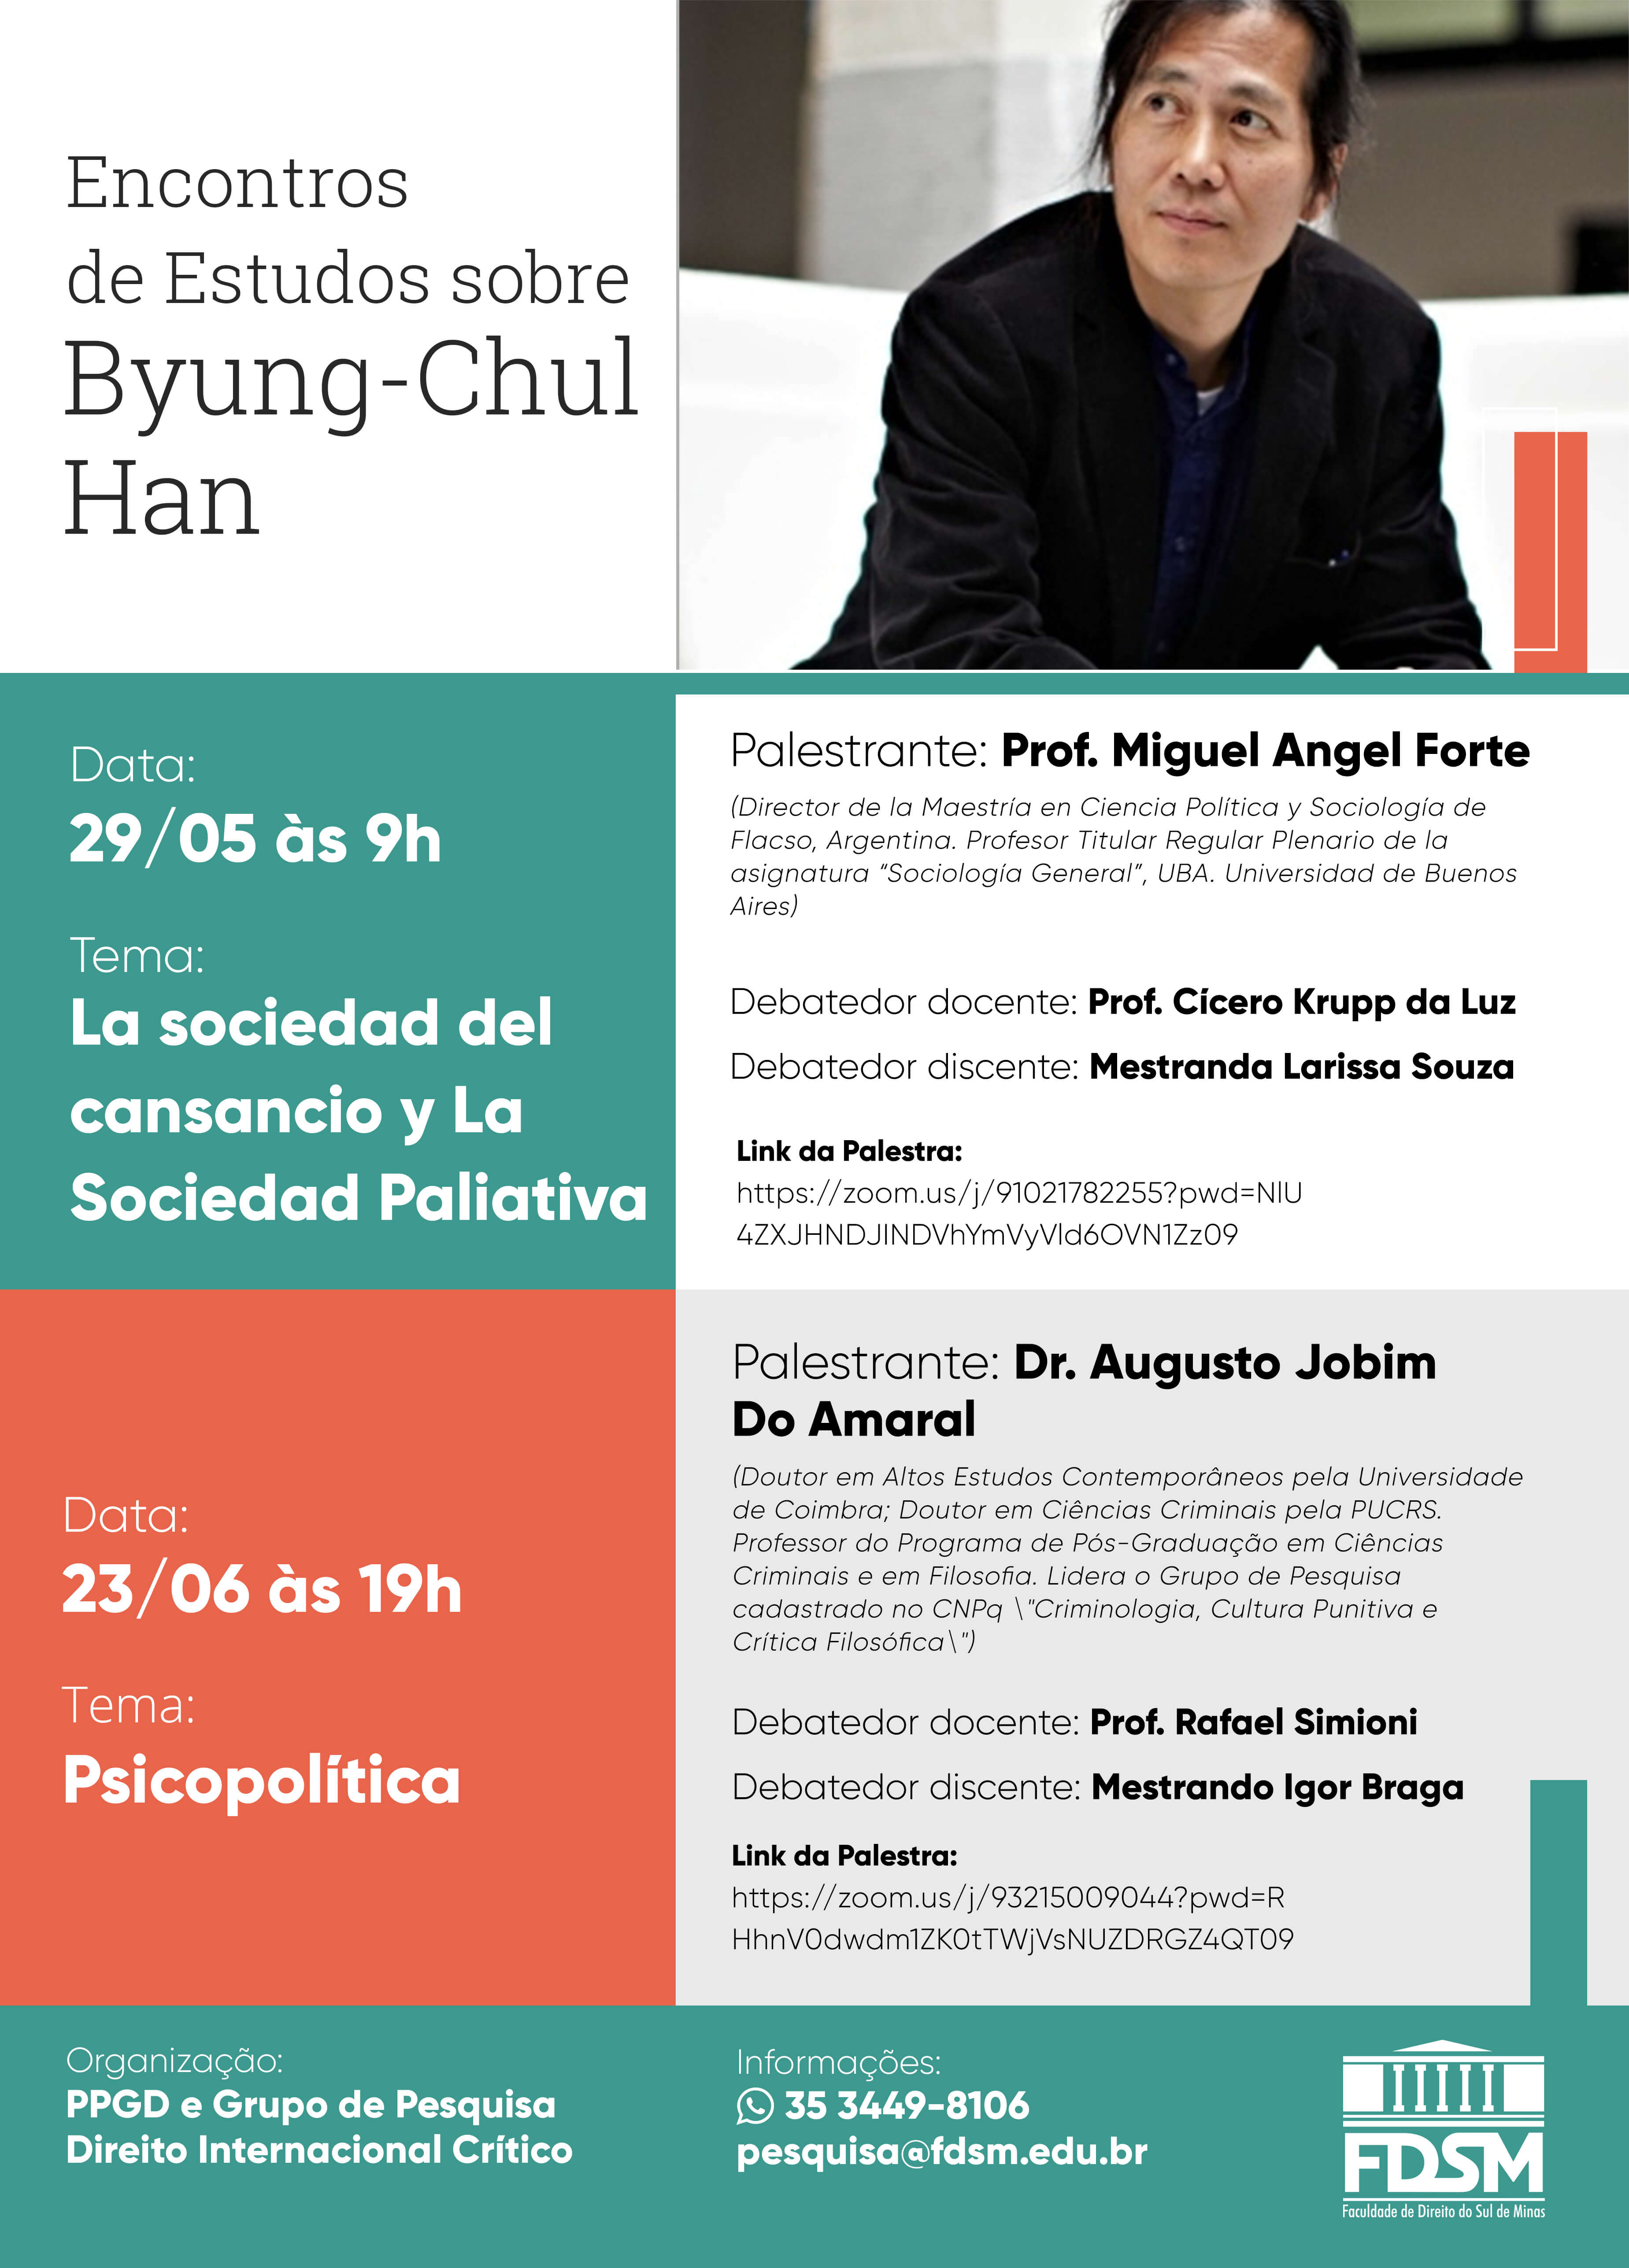 Evento 763 - ENCONTROS DE ESTUDOS SOBRE BYUNG-CHUL HAN